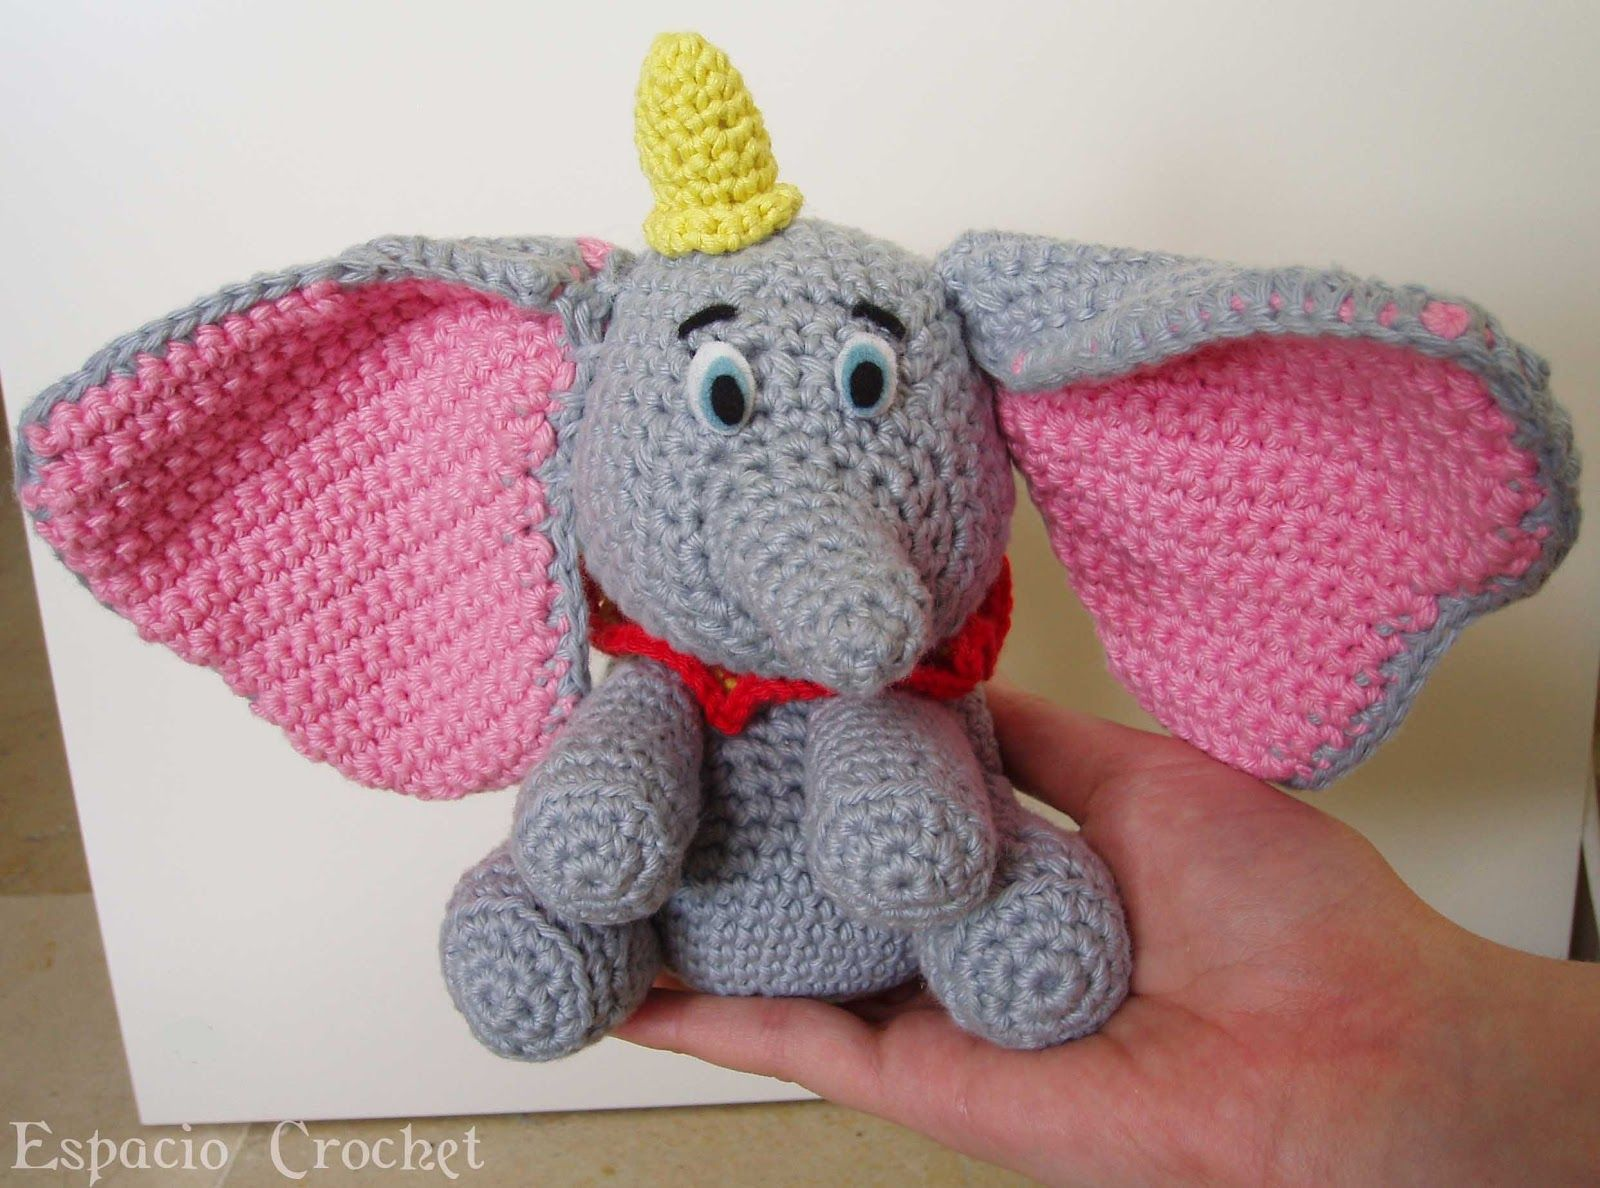 Luxury Häkeln Dumbo Muster Illustration - Decke Stricken Muster ...